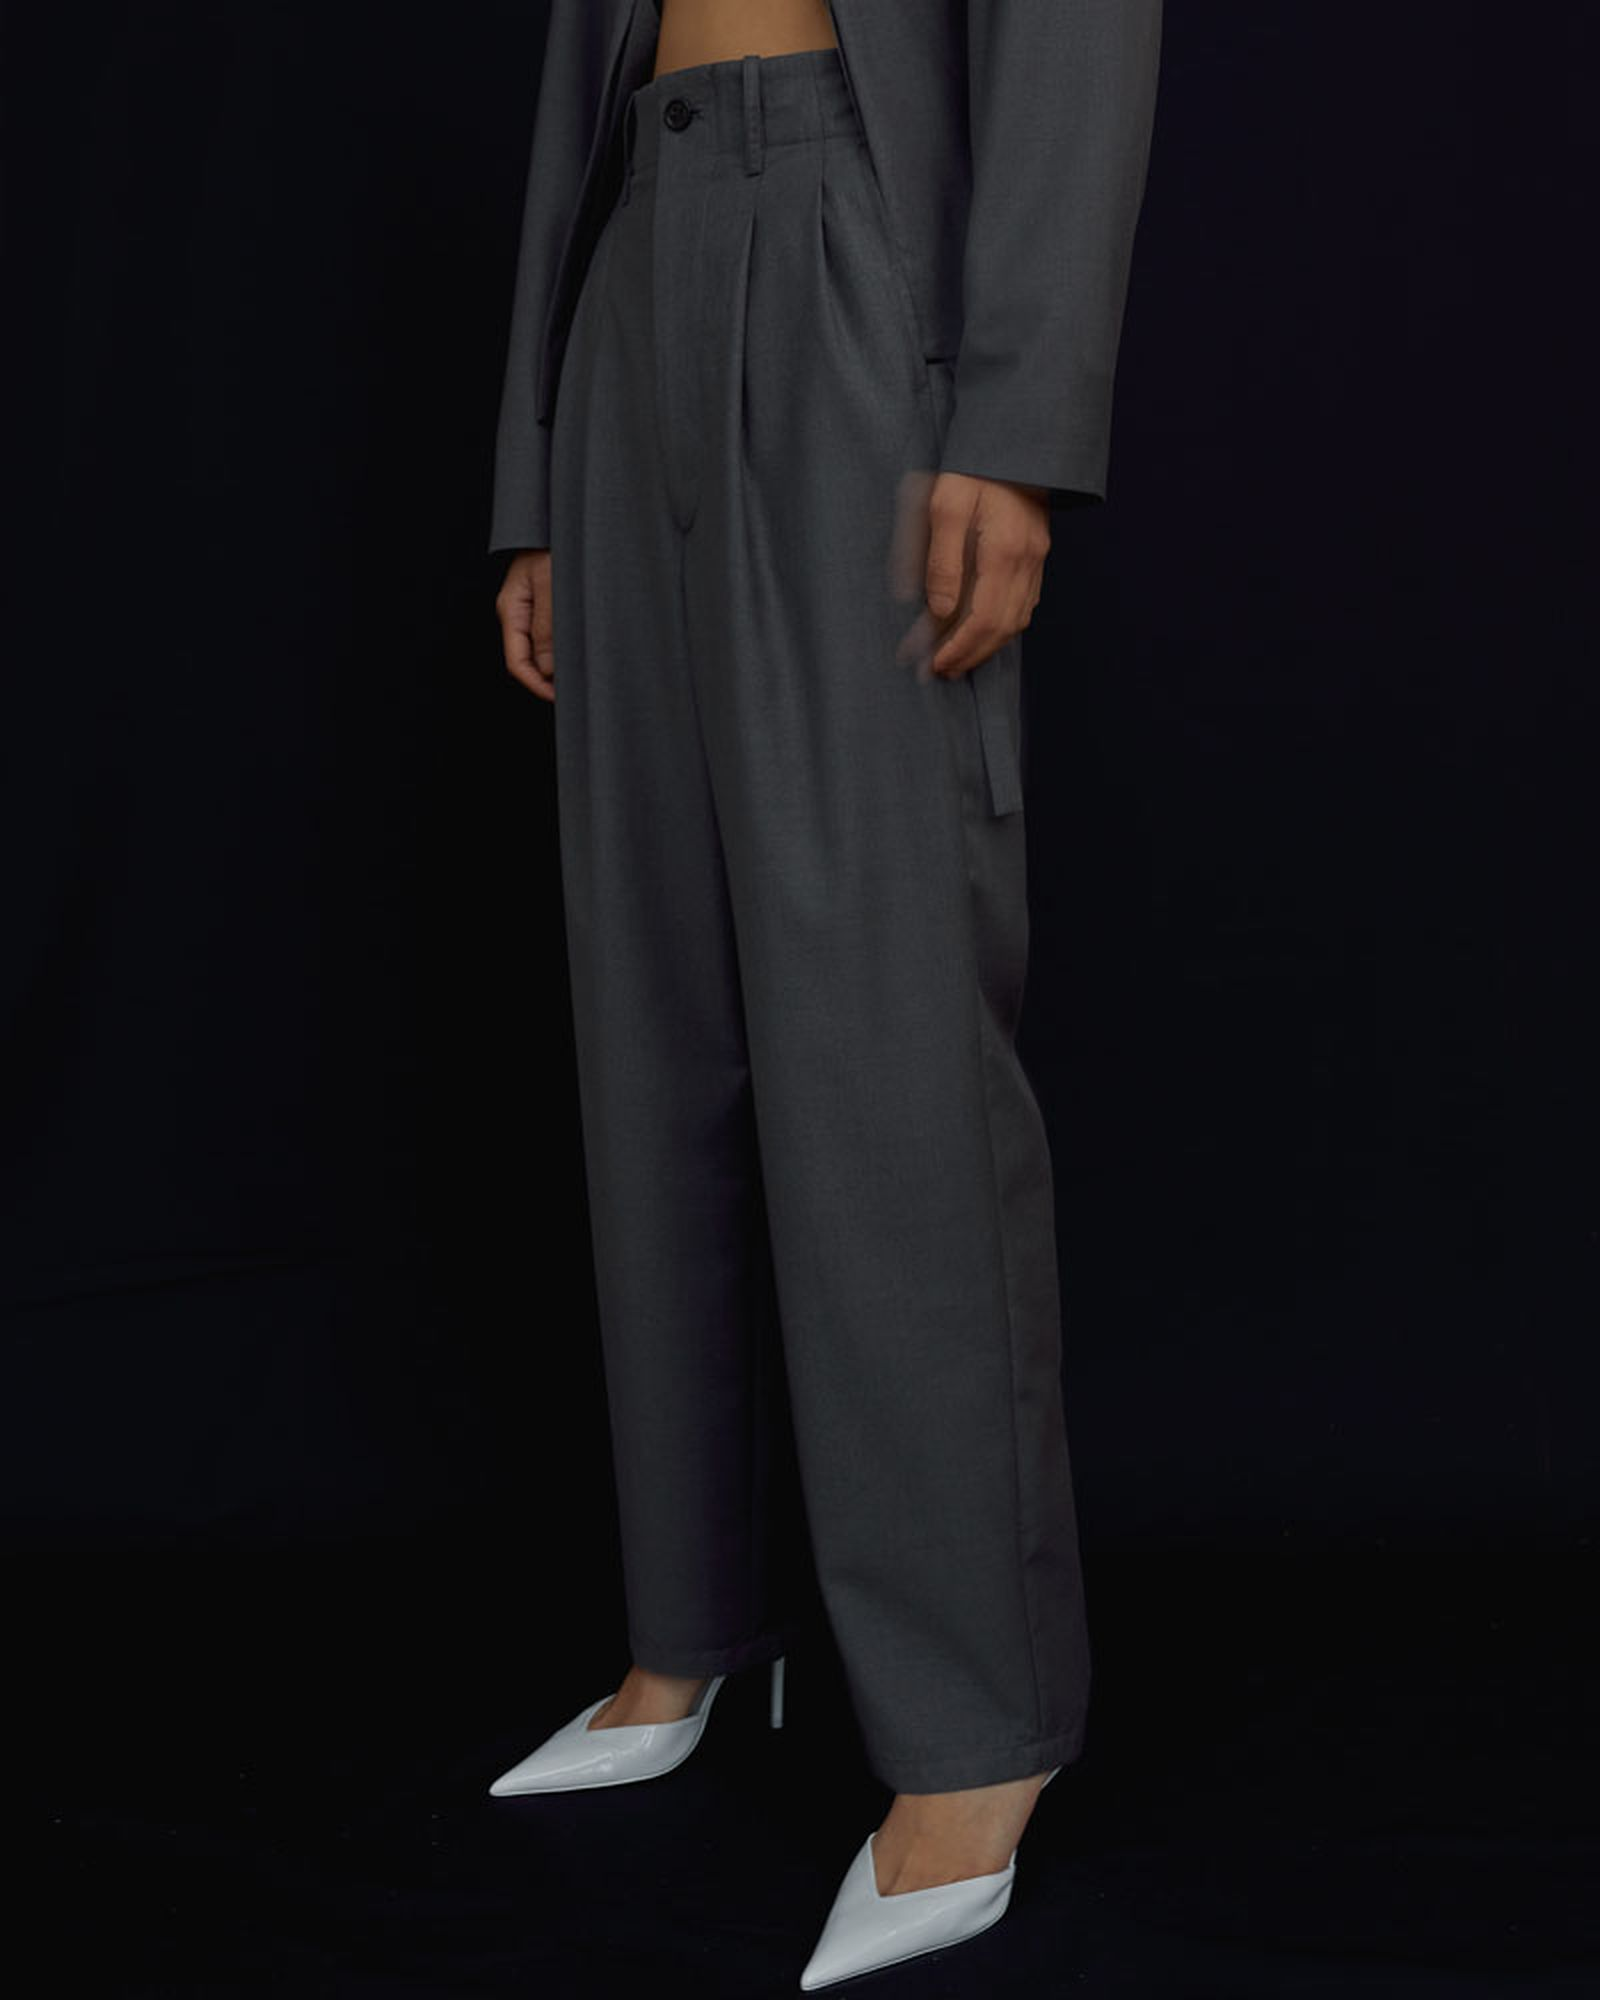 8one-dna-genderless-suiting-lookbook